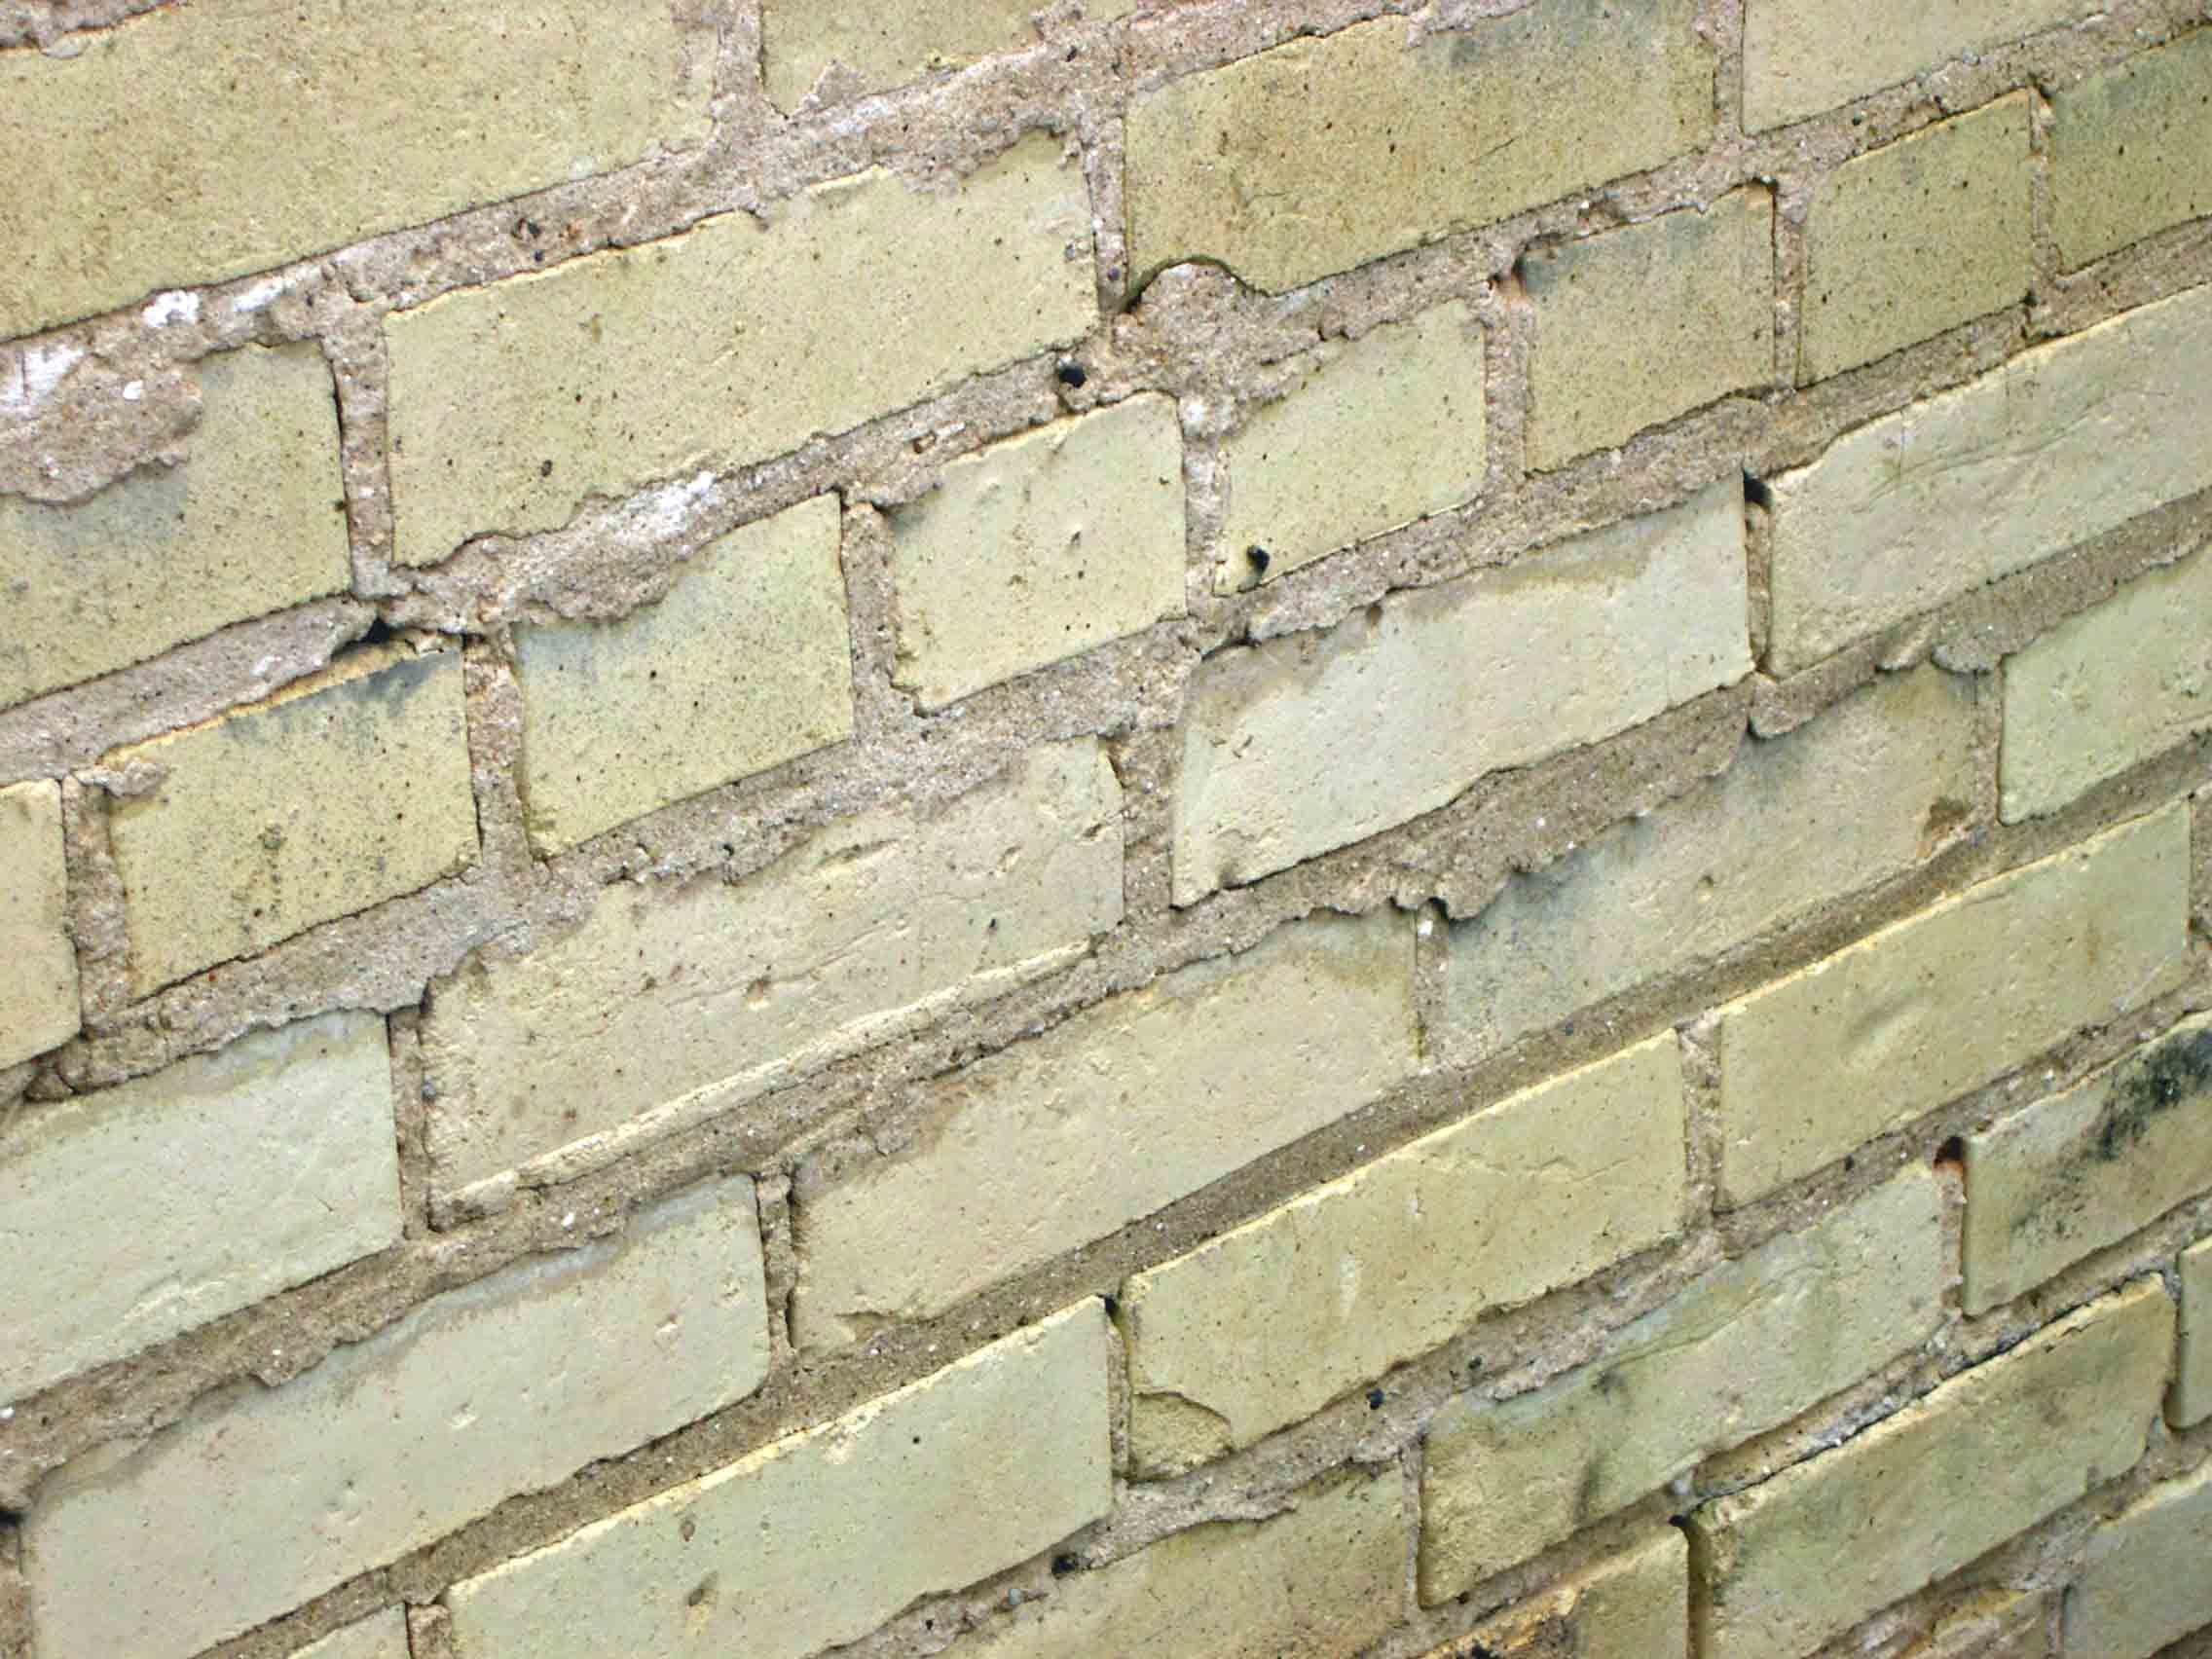 Milwaukee Cream City Brick 8 L X 2 1 4 H 3 5 W Shipping Weight Around Lbs Per Packed 530 Pallet